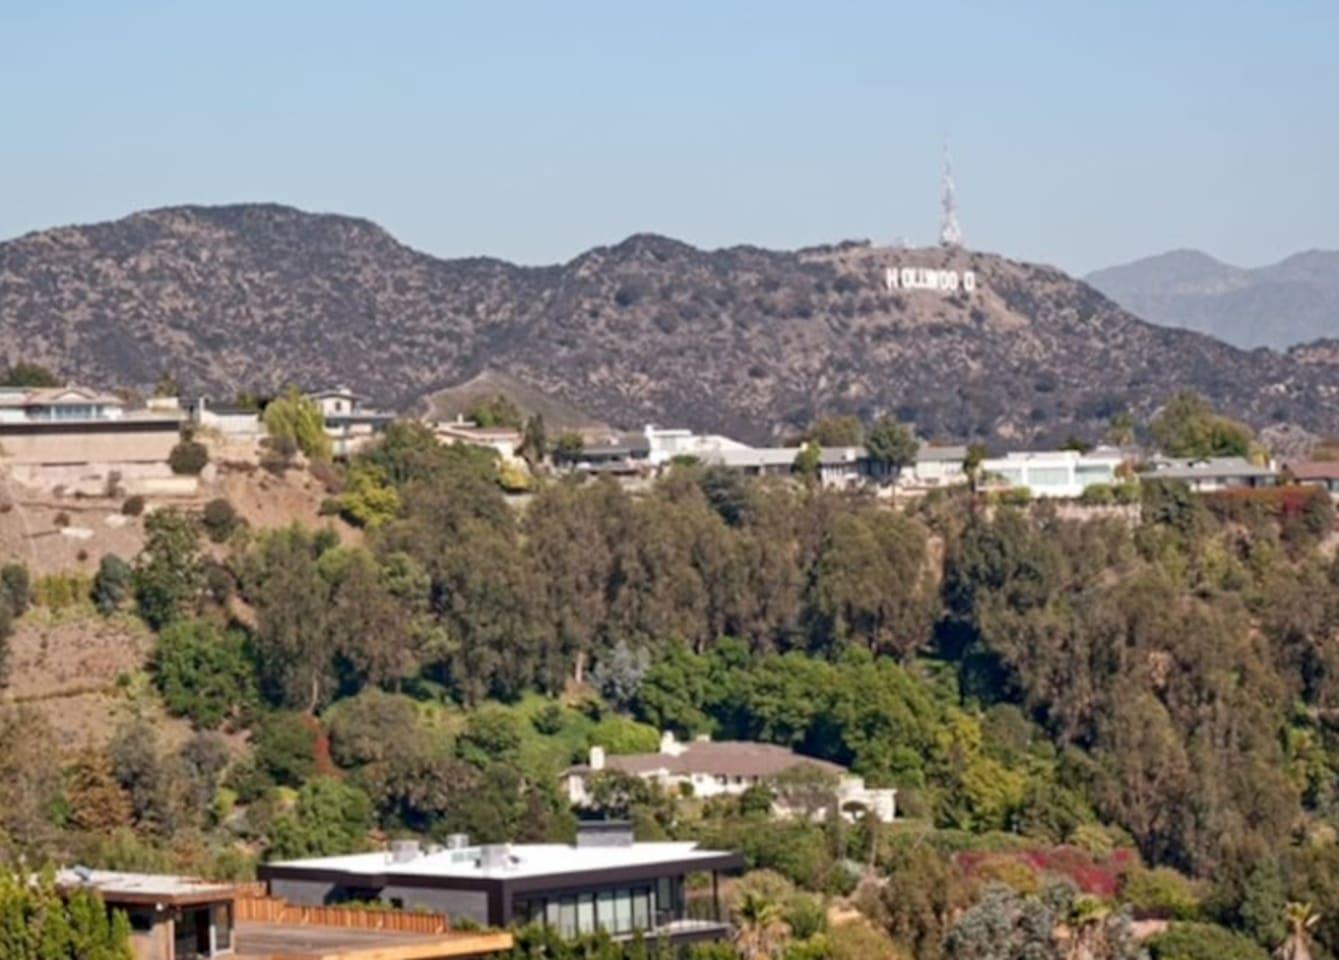 Close to Runyon Canyon / Hollywood Hills / Hollywood Blvd 10-15 min to this